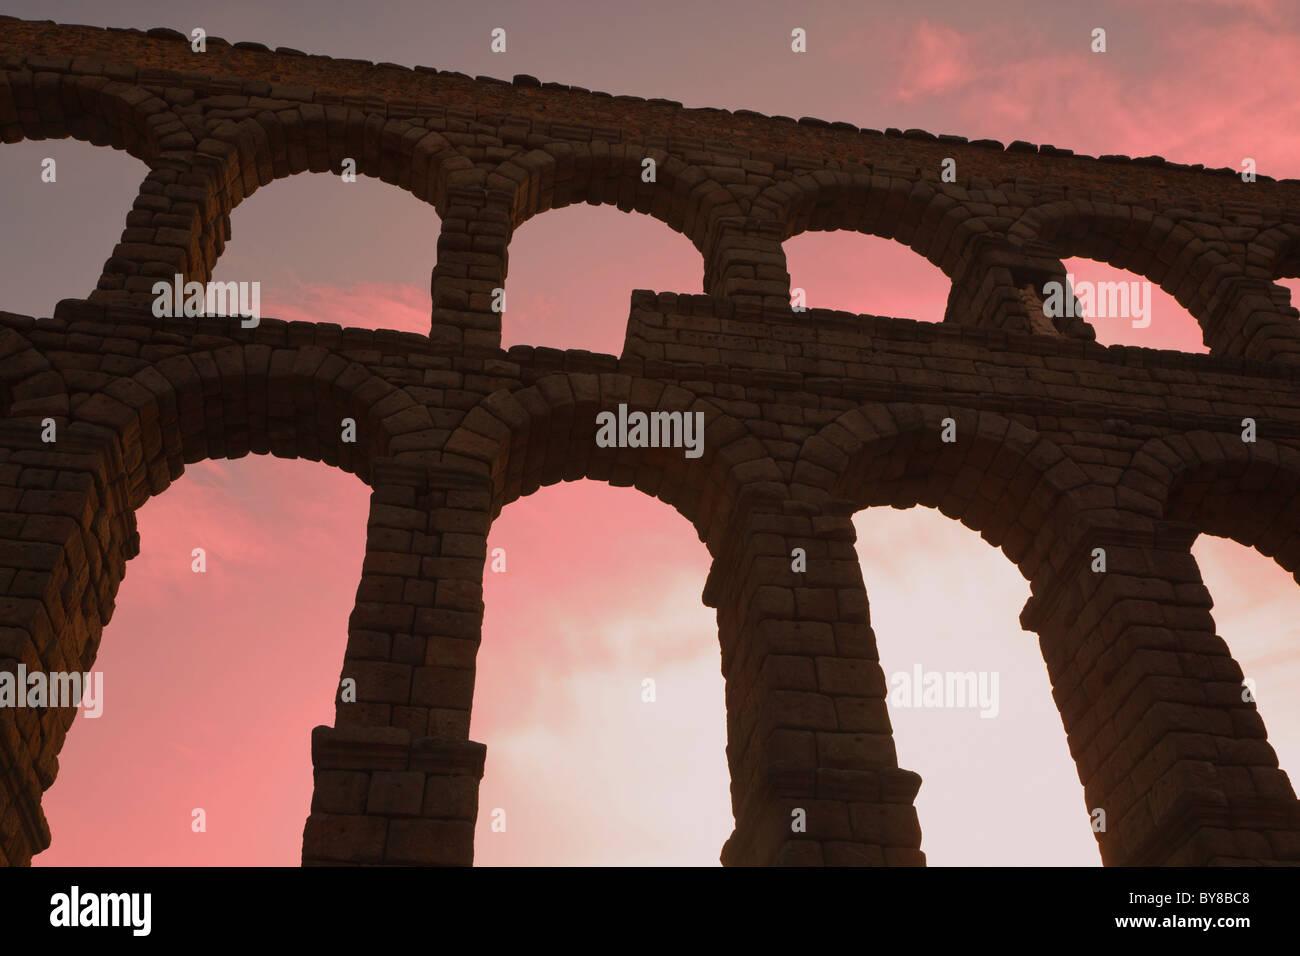 Segovia, Segovia Province, Spain. The Roman aqueduct. UNESCO World Heritage Site. - Stock Image